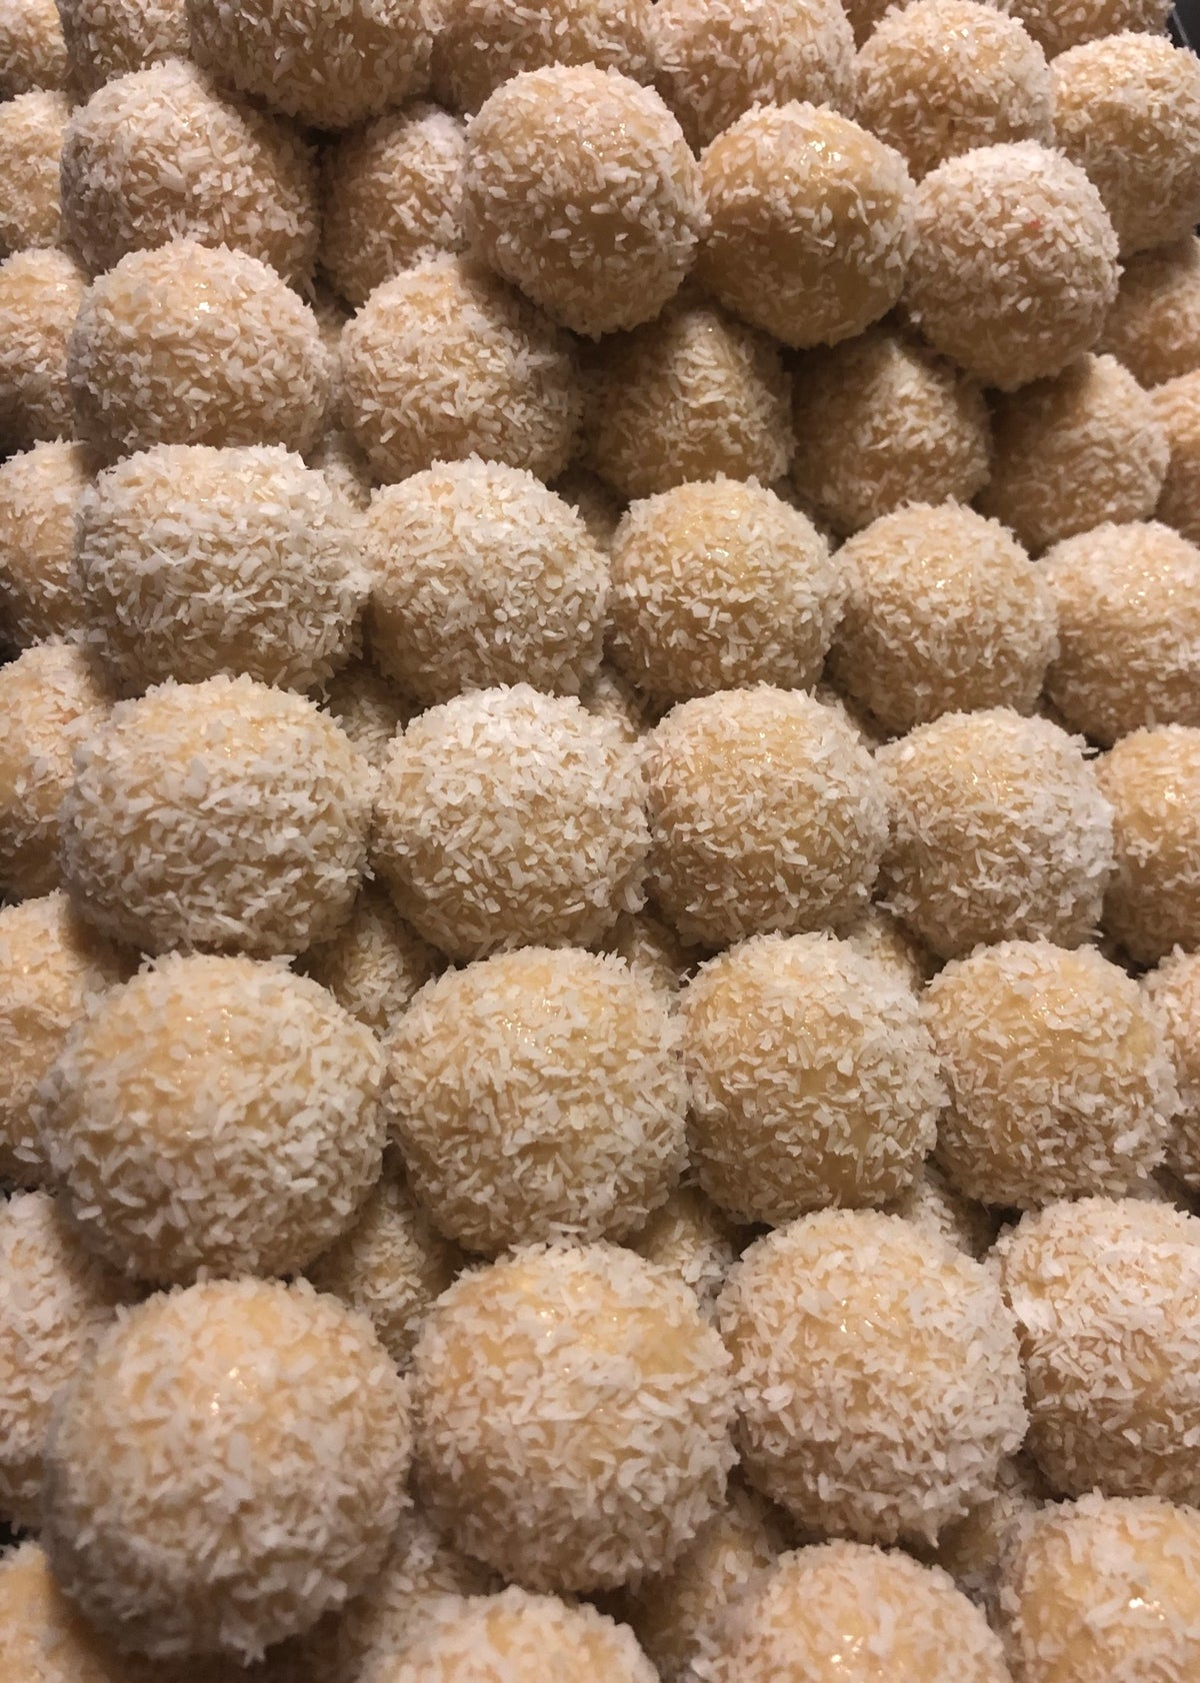 Image of Bliss Balls